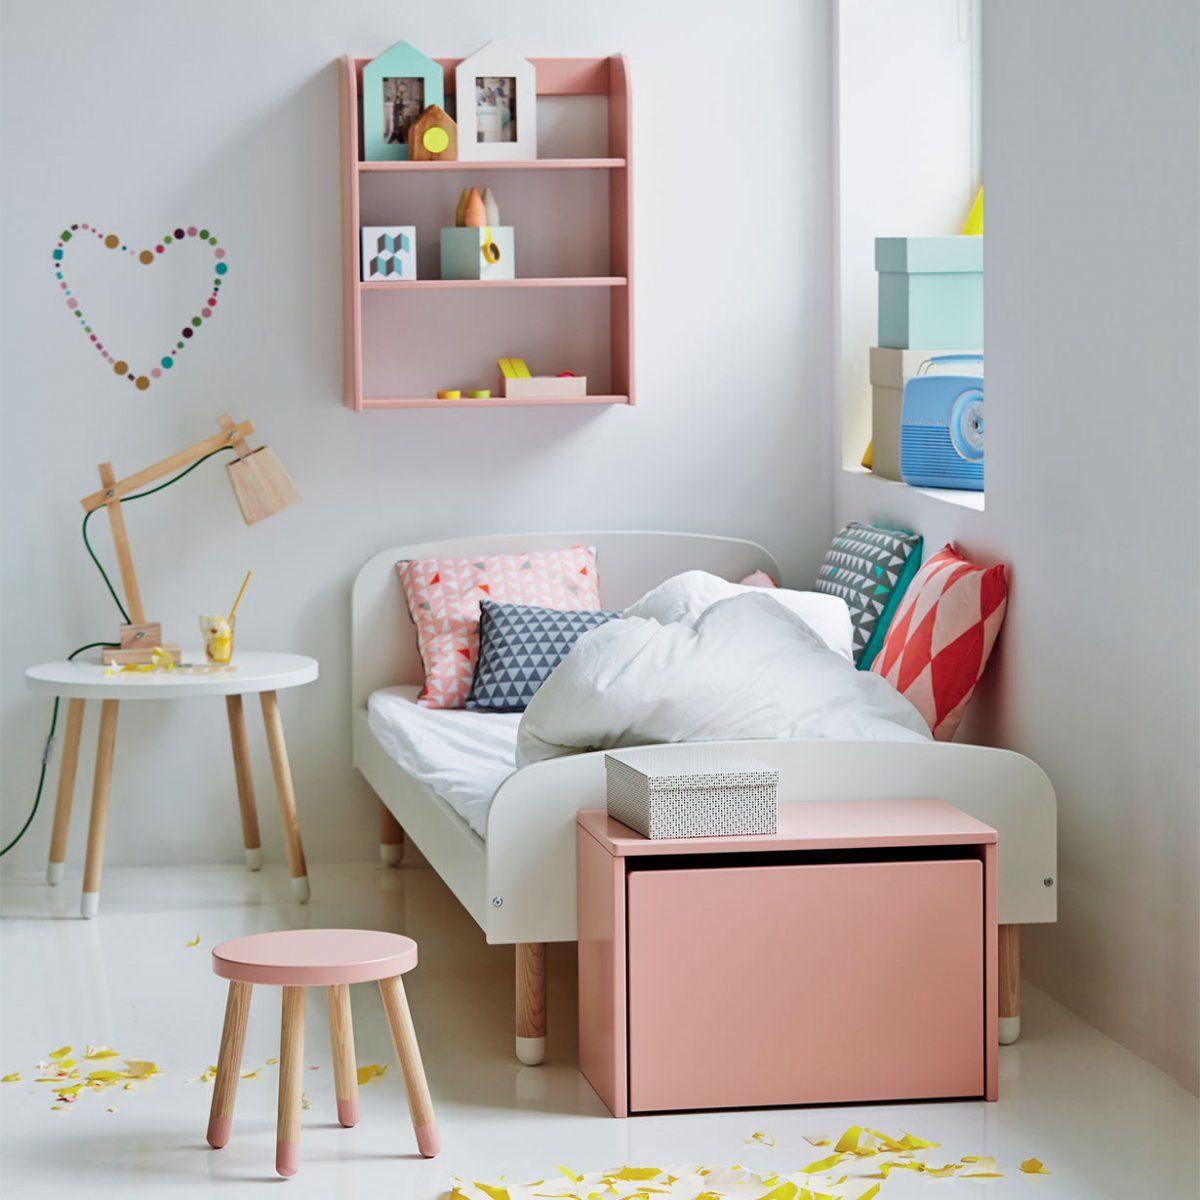 Letto Flexa.Sgabello Play In 2019 Shelfie Game Childrens Beds Kids Room